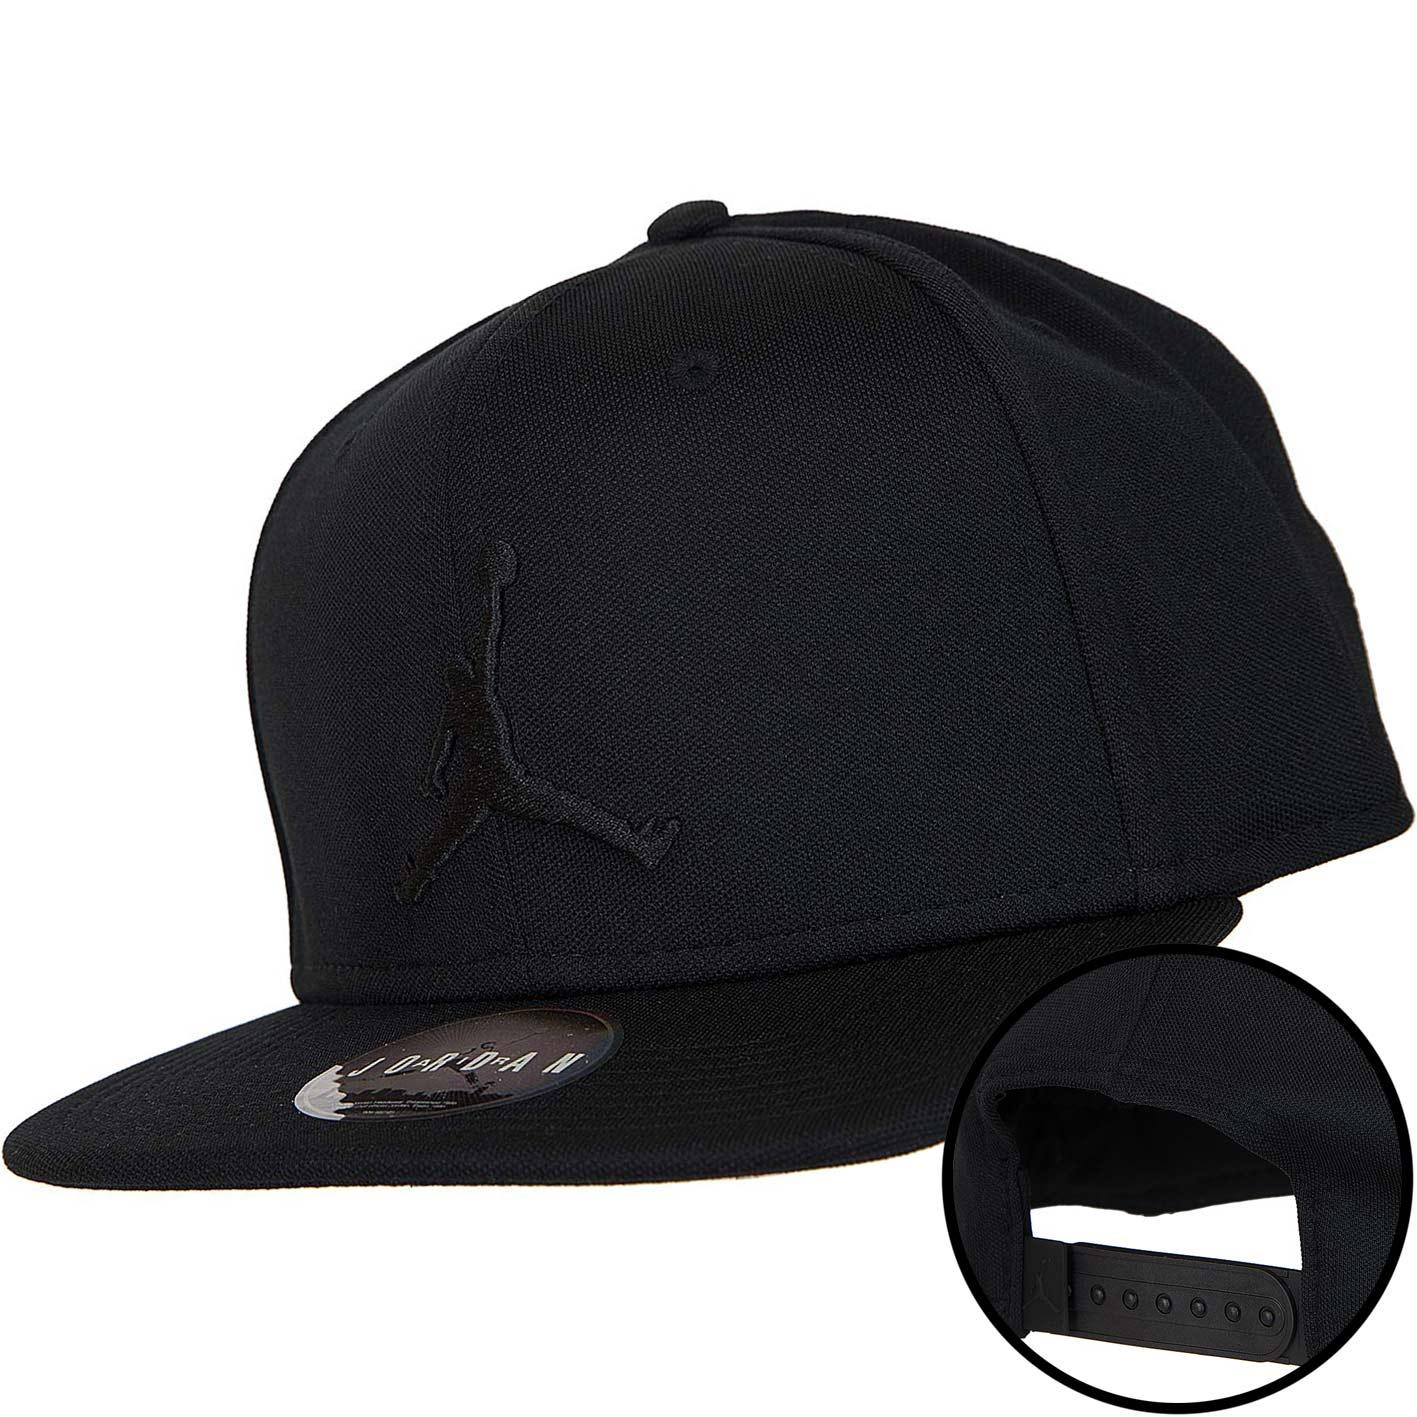 best value pretty nice really comfortable Nike Snapback Cap Jordan Jumpman black/schwarz